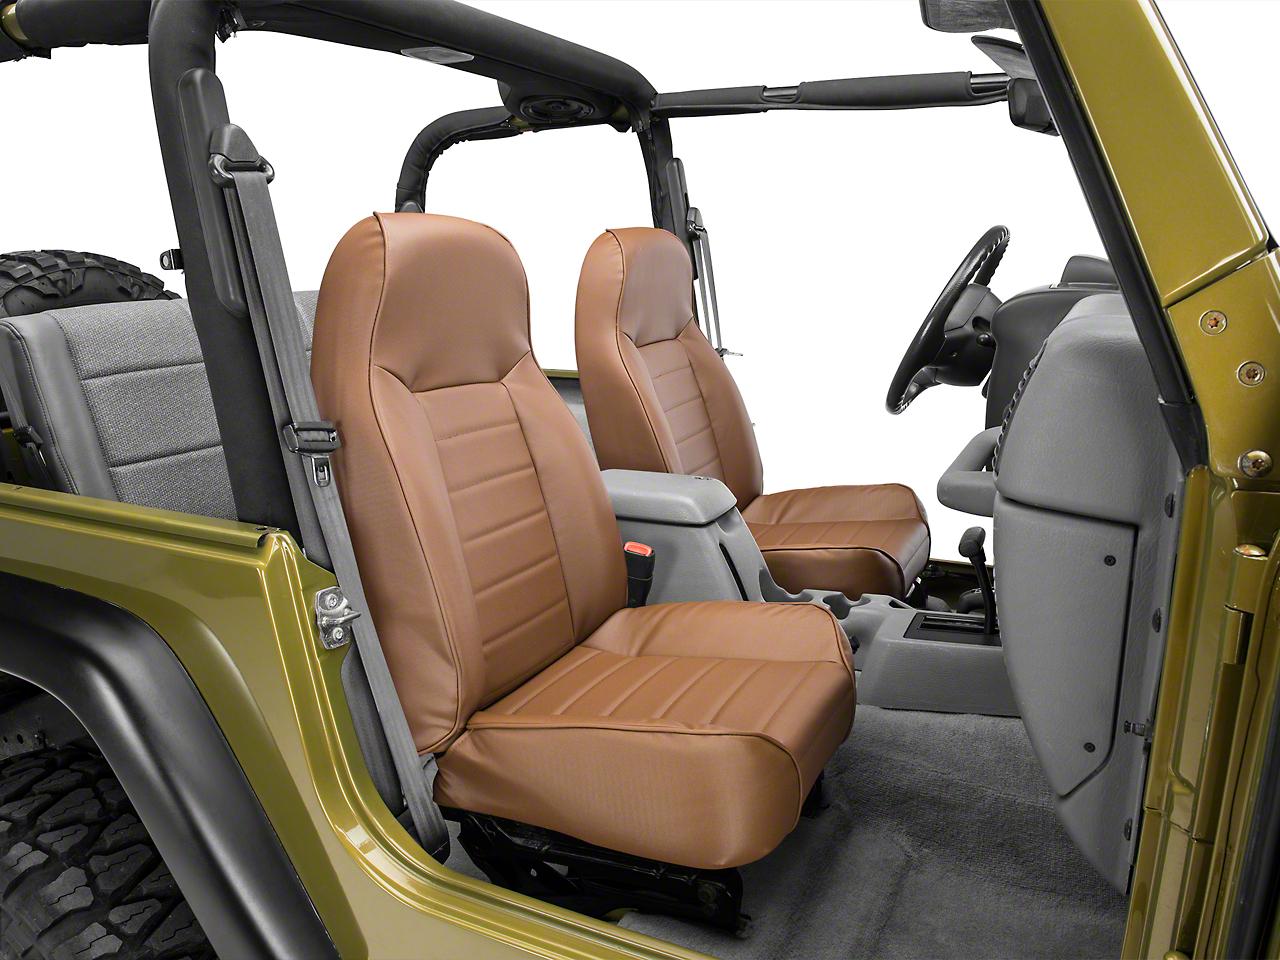 Smittybilt Standard Front Bucket Seat - Spice Denim (87-06 Jeep Wrangler YJ & TJ)